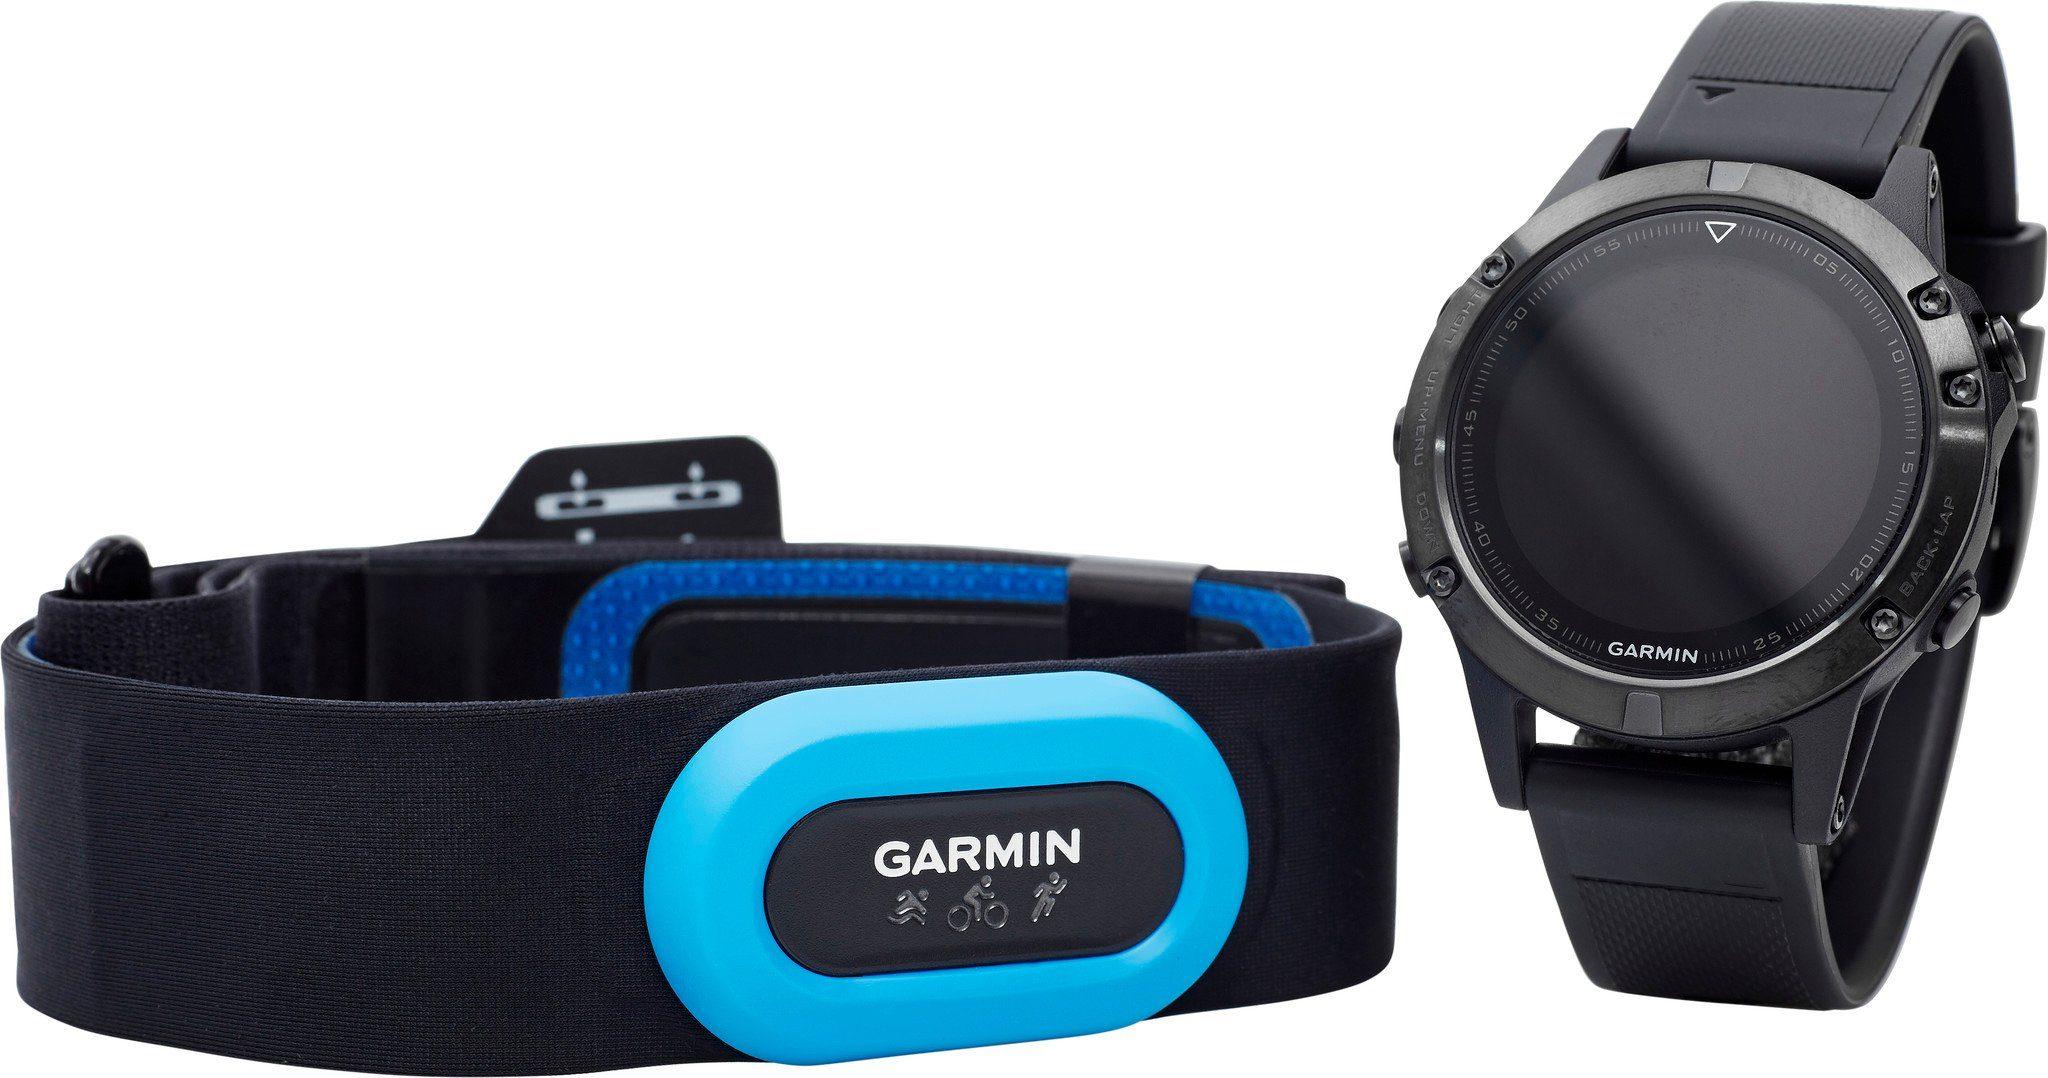 Sportuhr Intervall : Garmin sportuhr fenix saphir gps uhr performer bundle premium